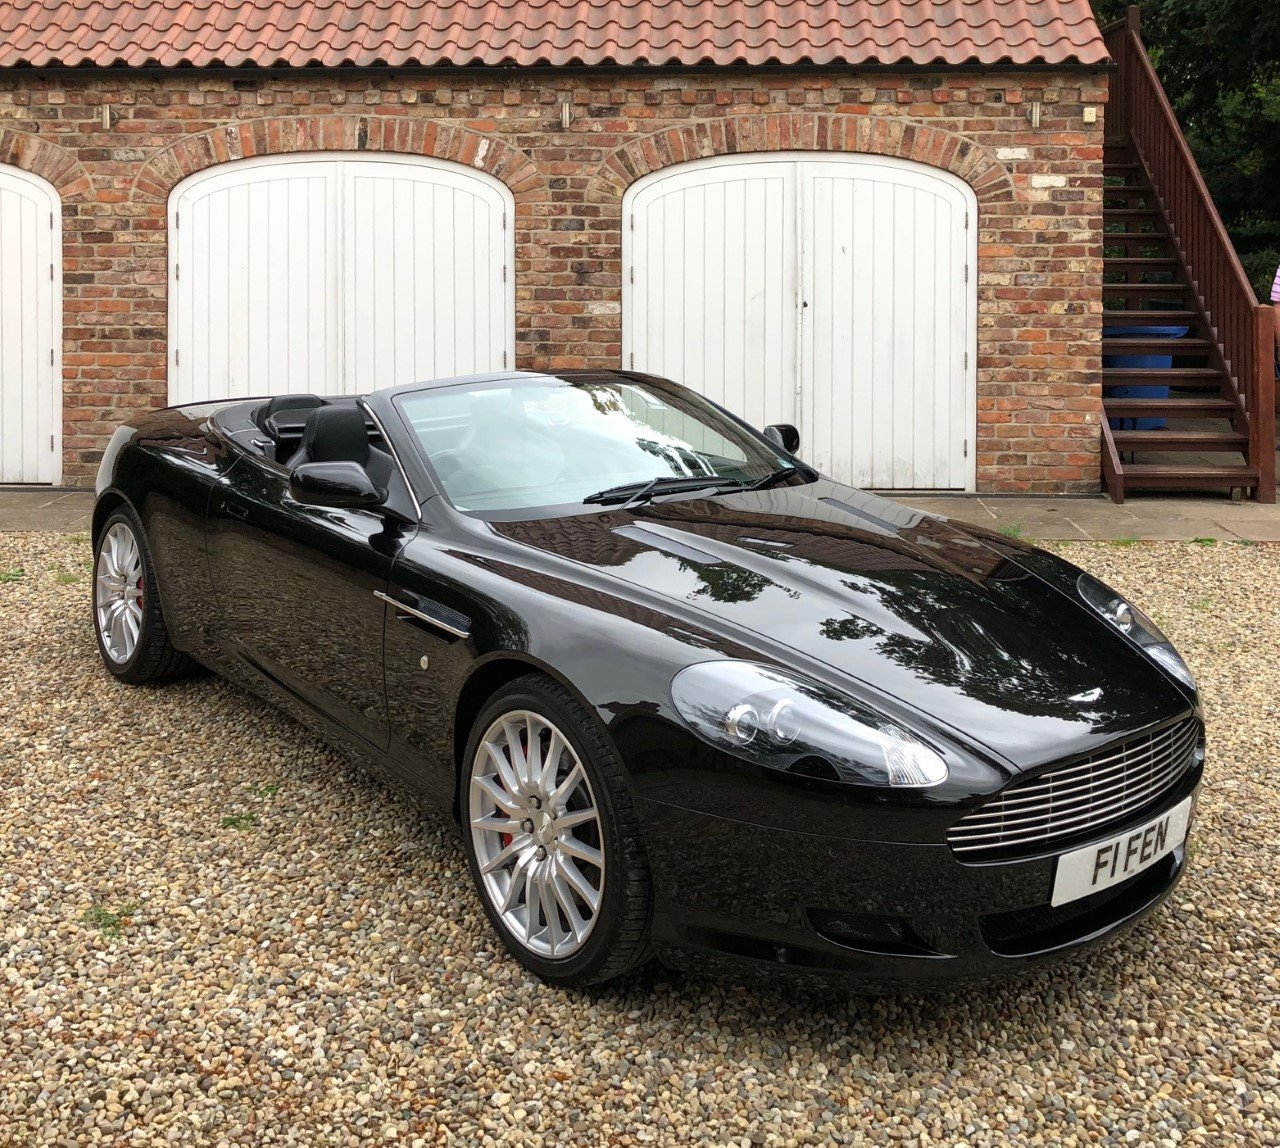 2006 Aston Martin Db9 Volante Manual For Sale Car And Classic